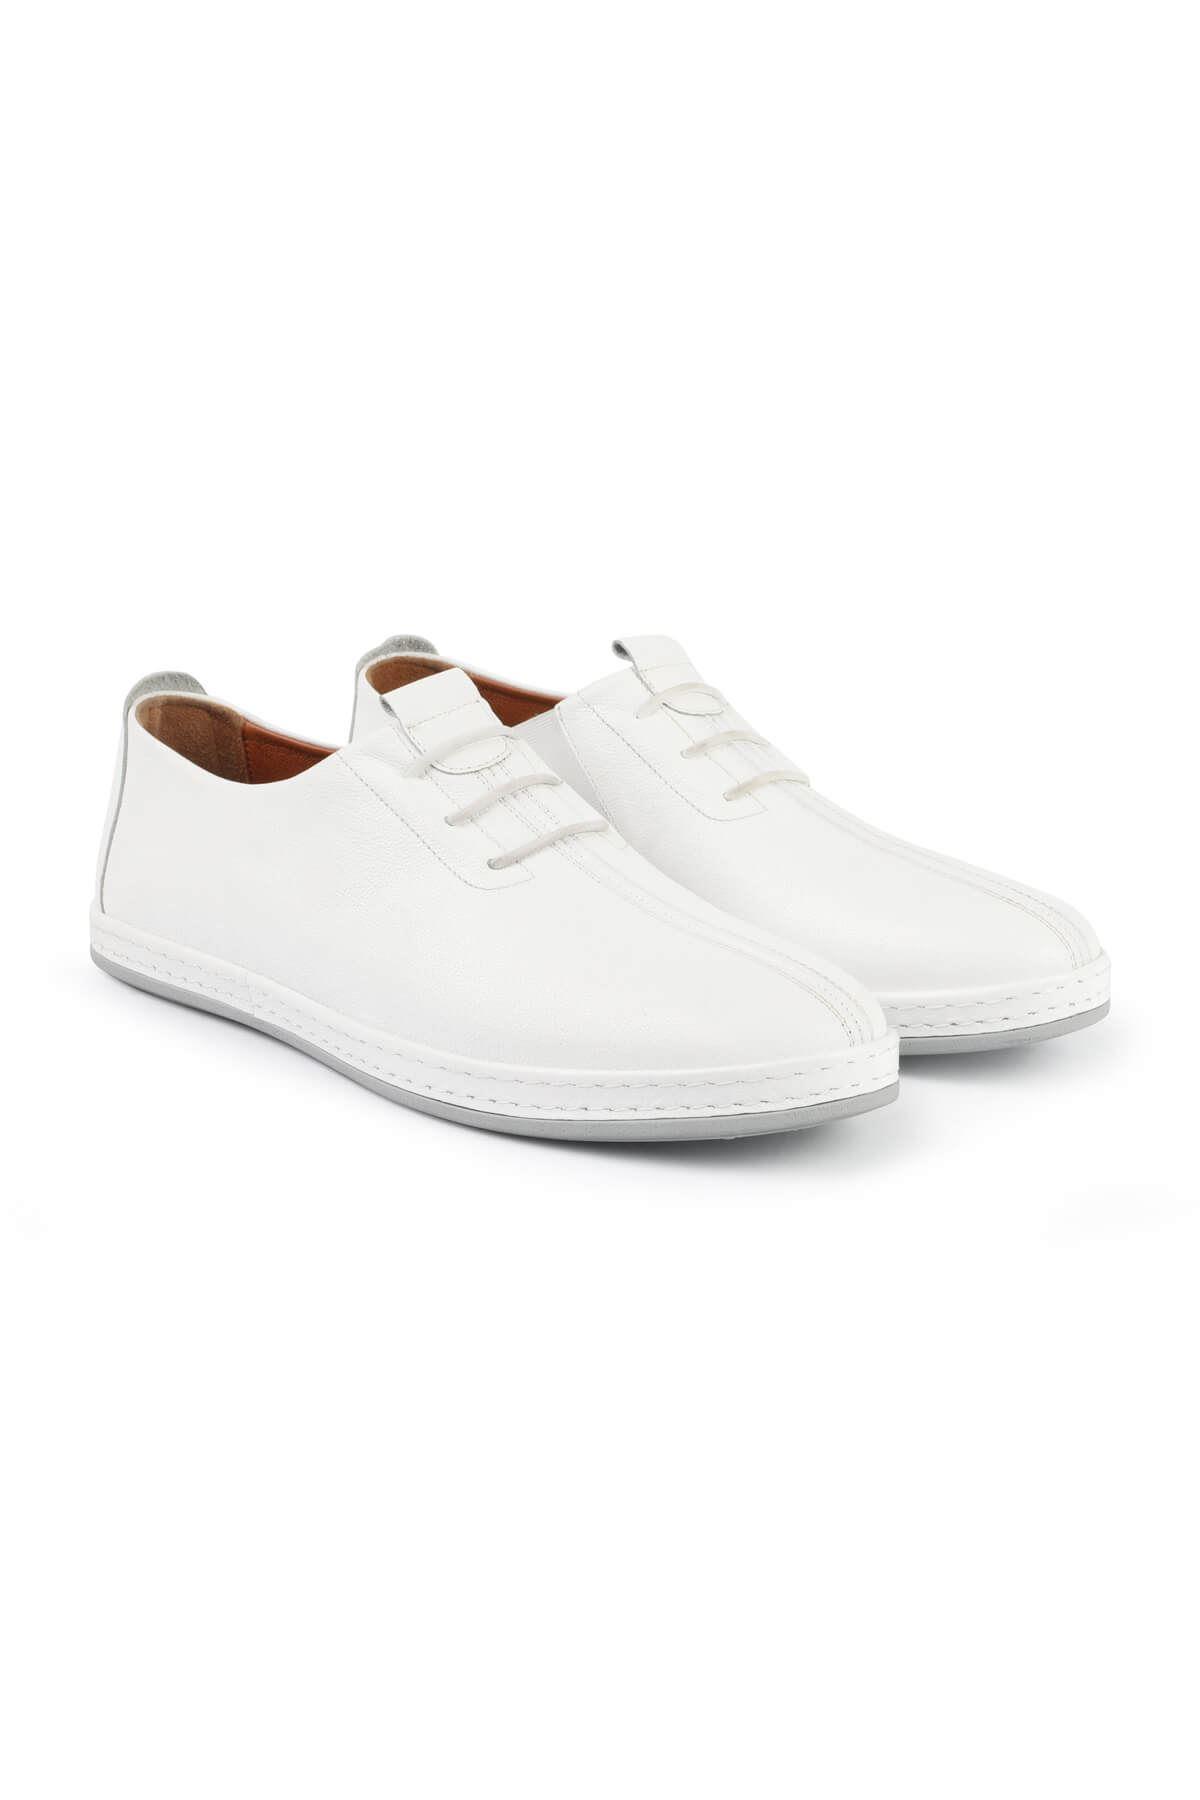 Libero 3042 Beyaz Casual Ayakkabı